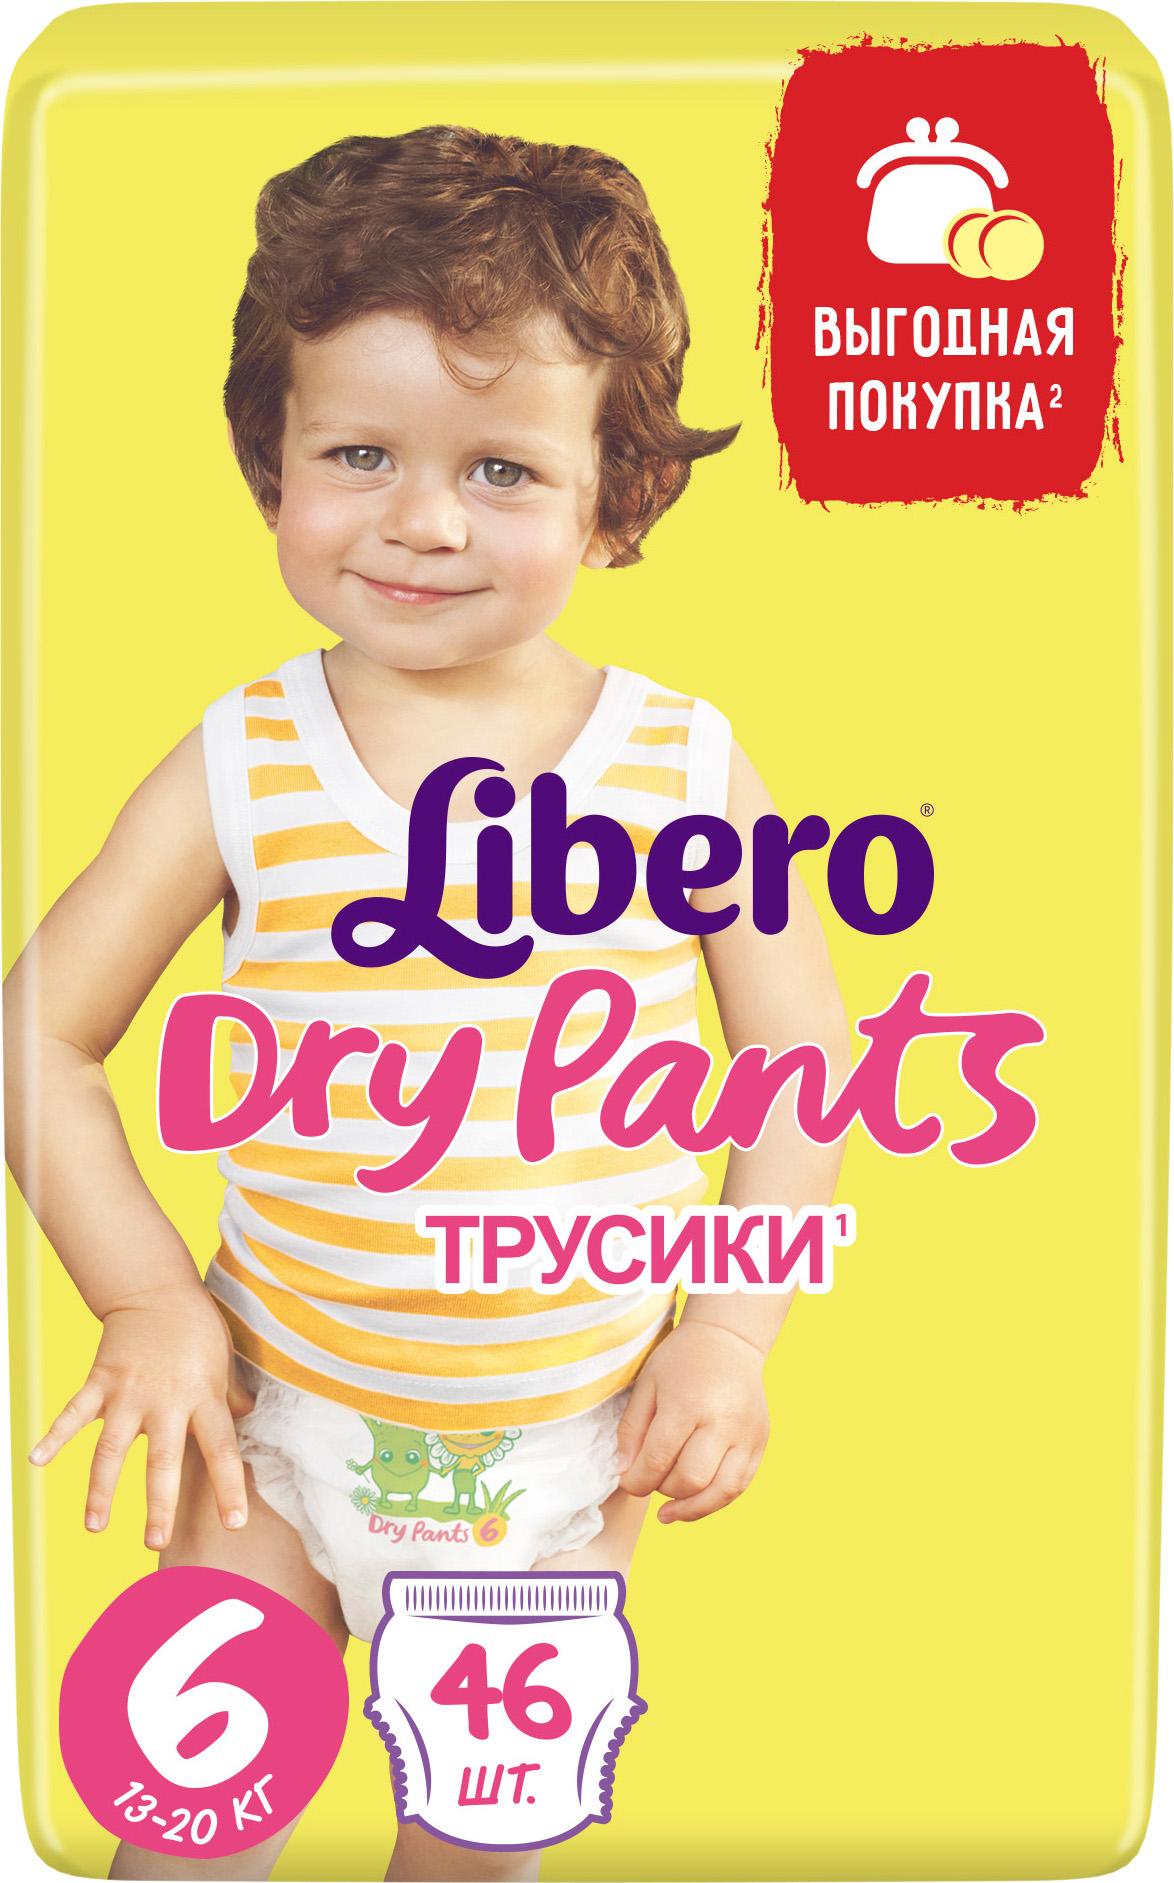 Подгузники для малышей Libero Dry Pants 6 (13-20 кг) 46 шт. трусики libero dry pants size 6 13 20кг 46 шт